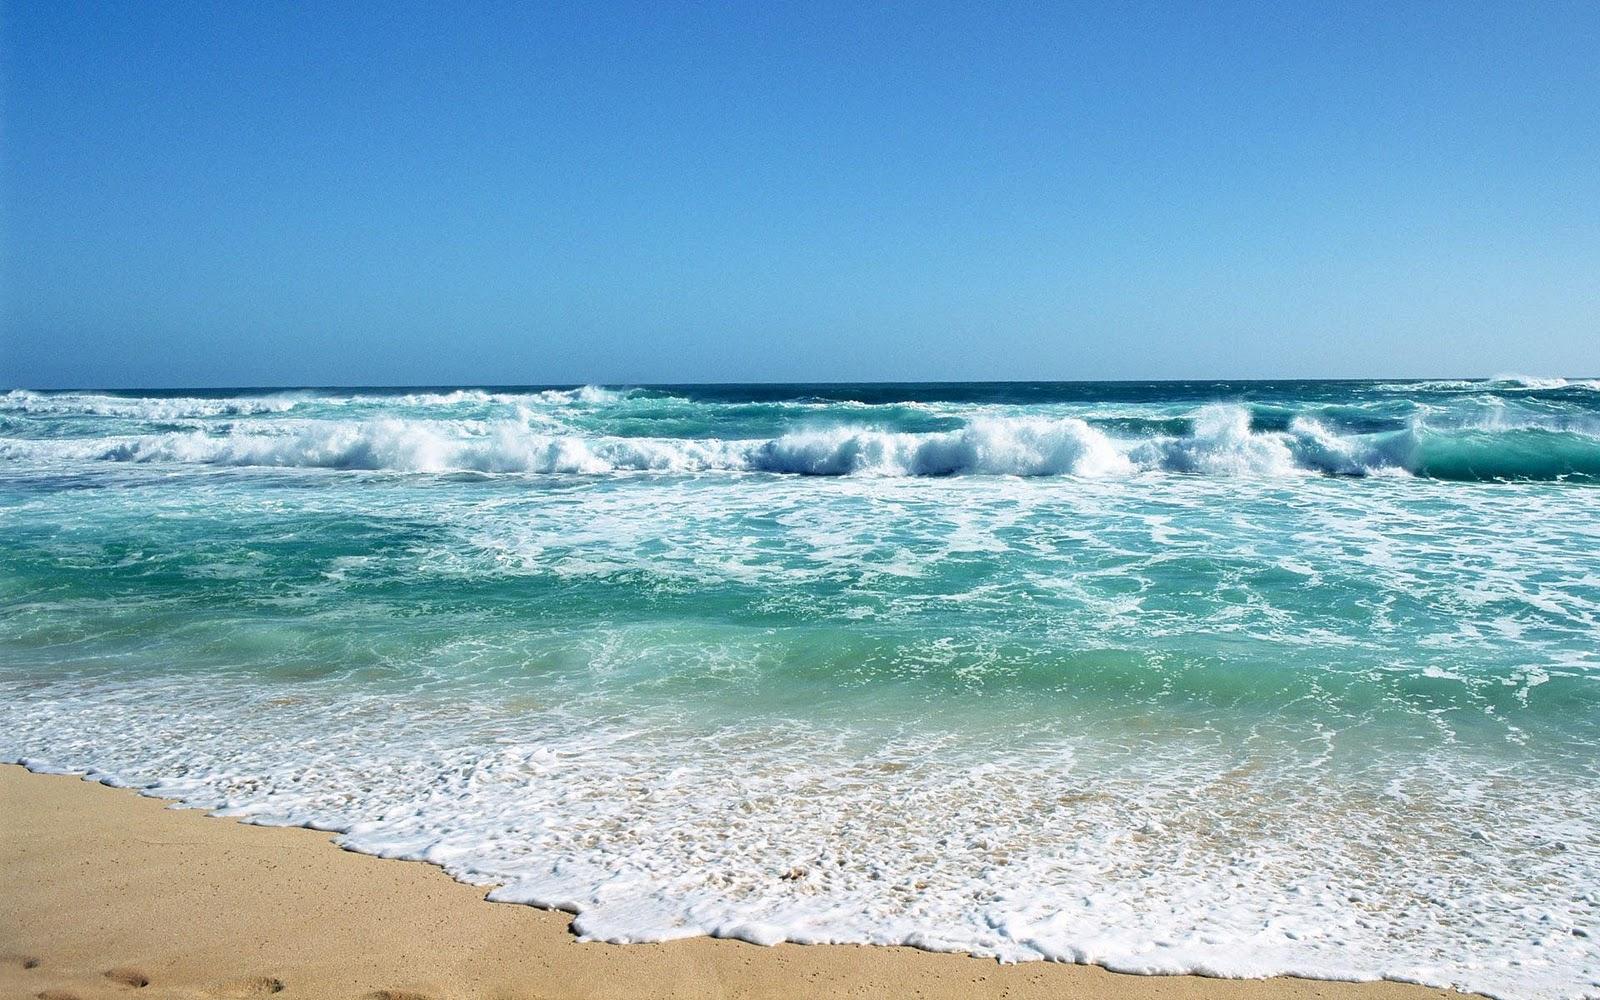 Mooie-zee-achtergronden-leuke-hd-zee-wal